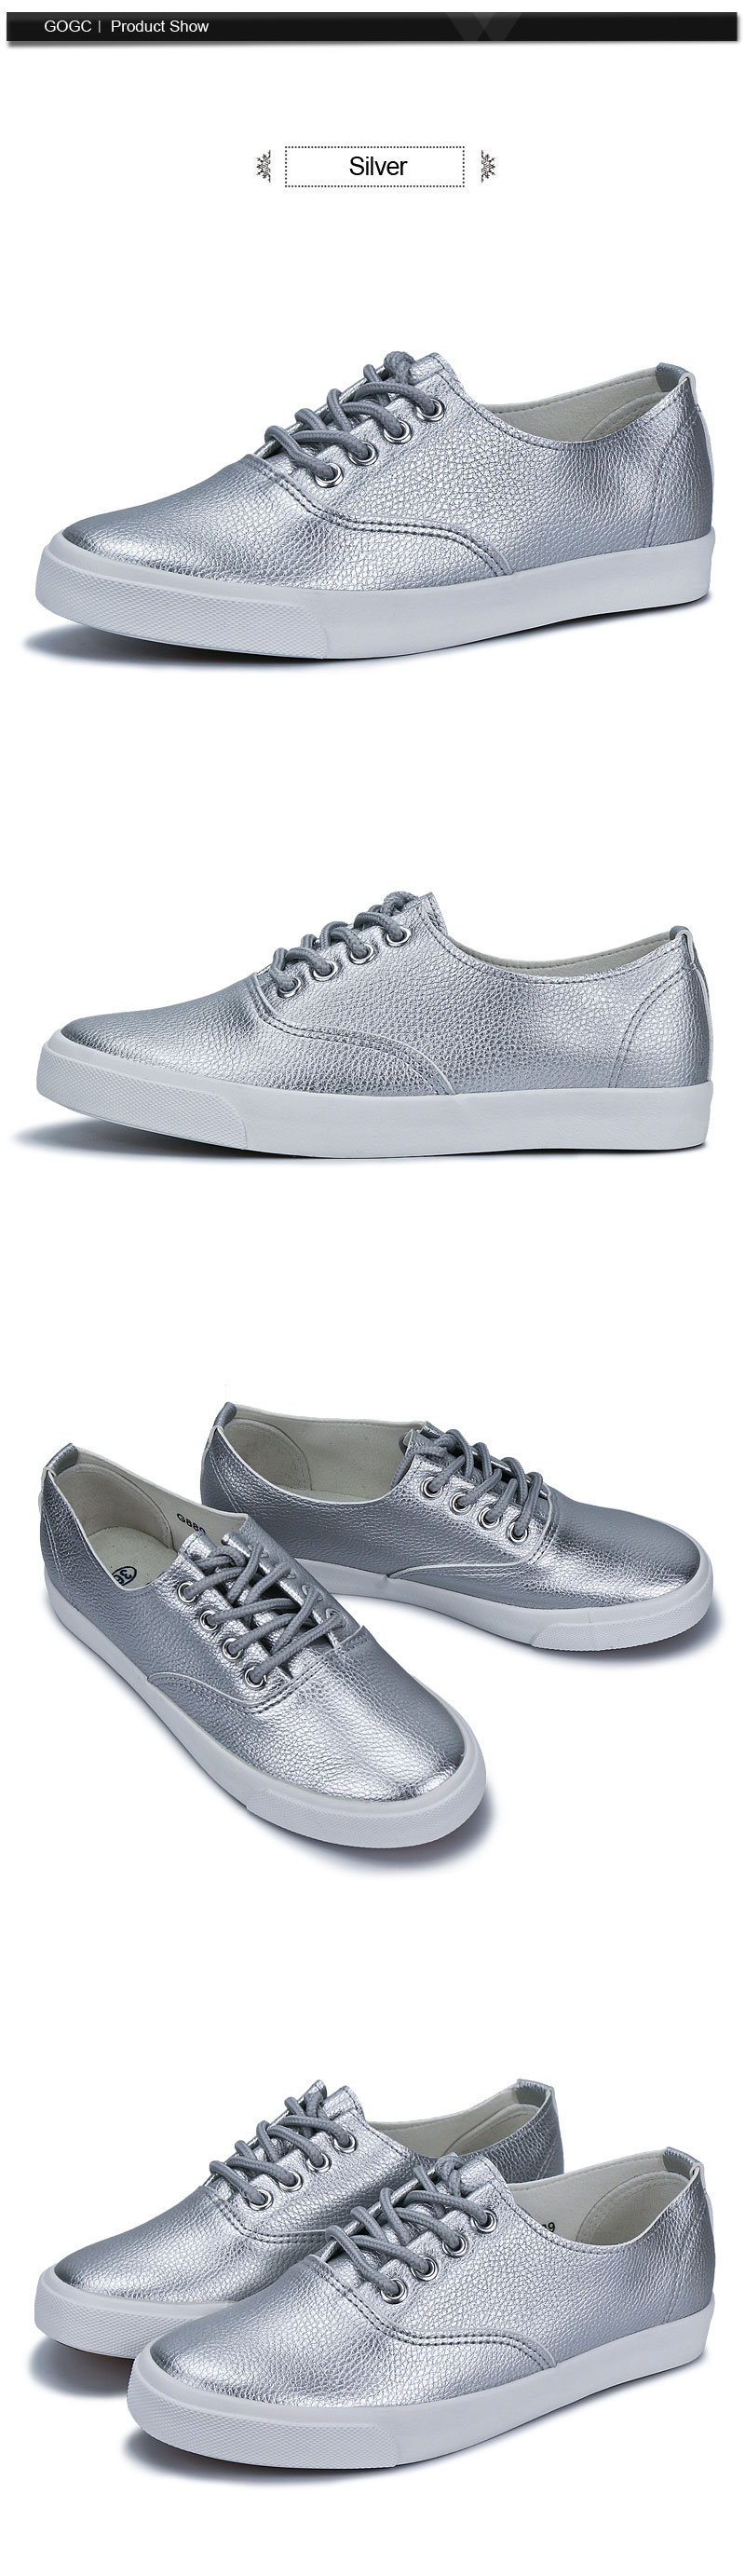 ed0b4eb3a6bd7 GOGC 2017 New Slipony Women Black White Leather Casual Shoes Women Flats  Shoes Breathable Sneakers Walking Shoes Women Sneakers